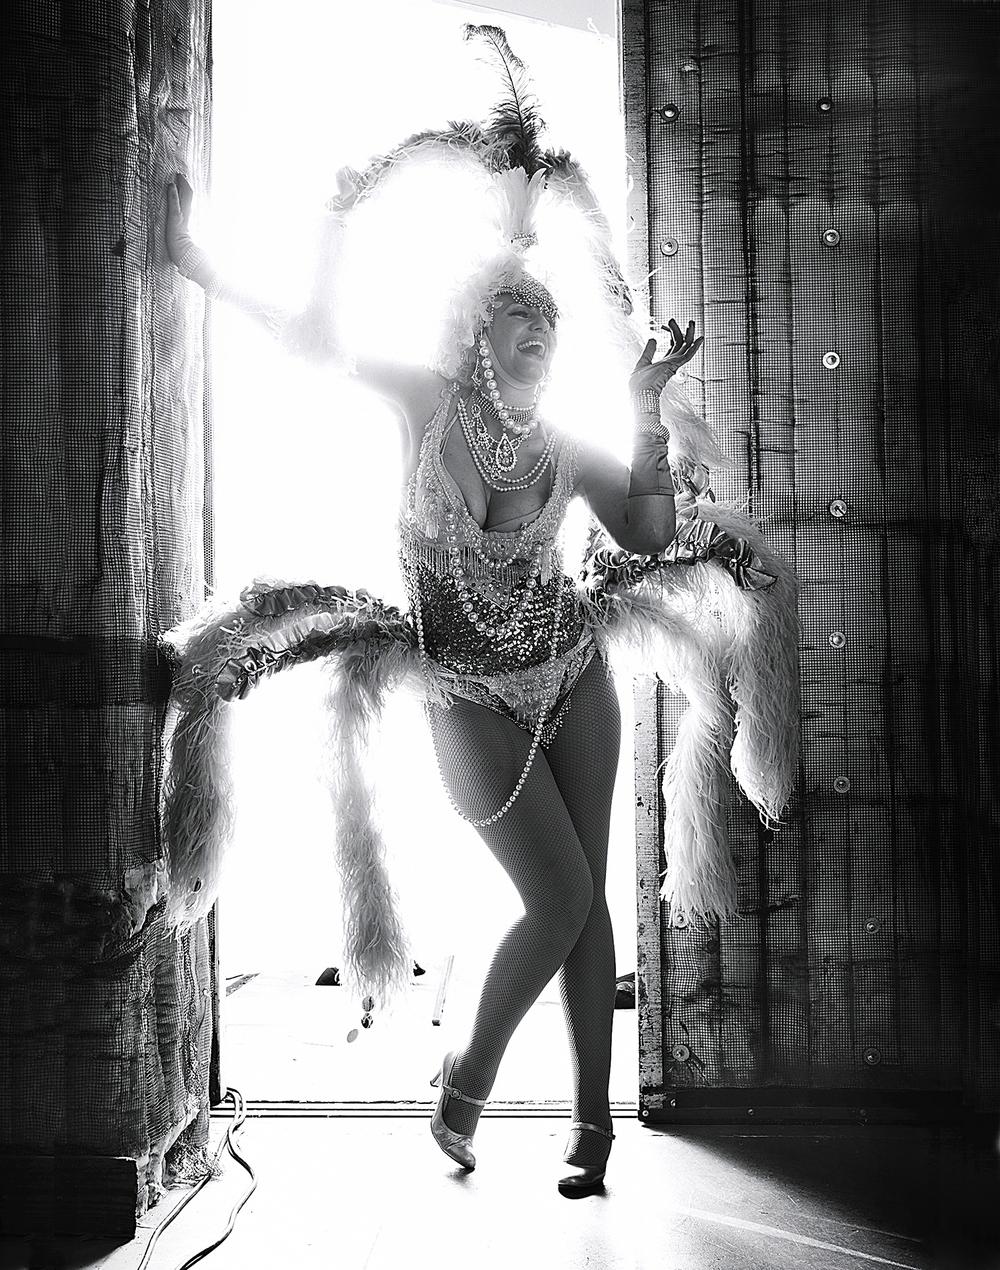 Showgirl_Portrait_143.jpg